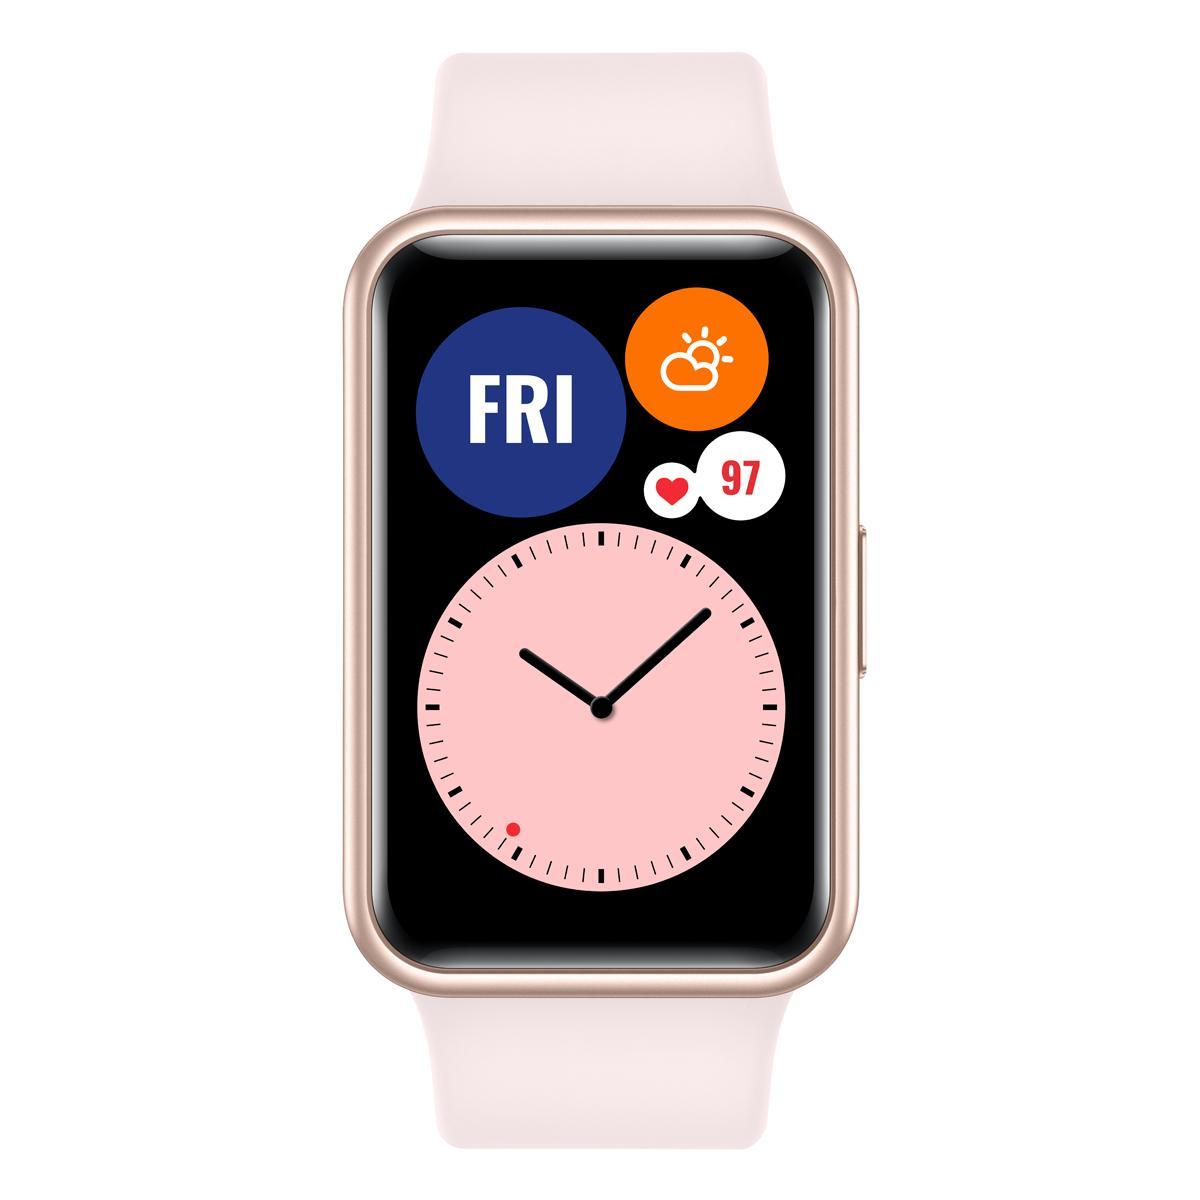 Išmanusis laikrodis FIT / PINK 55025876 HUAWEI Žema kaina | Varle.lt